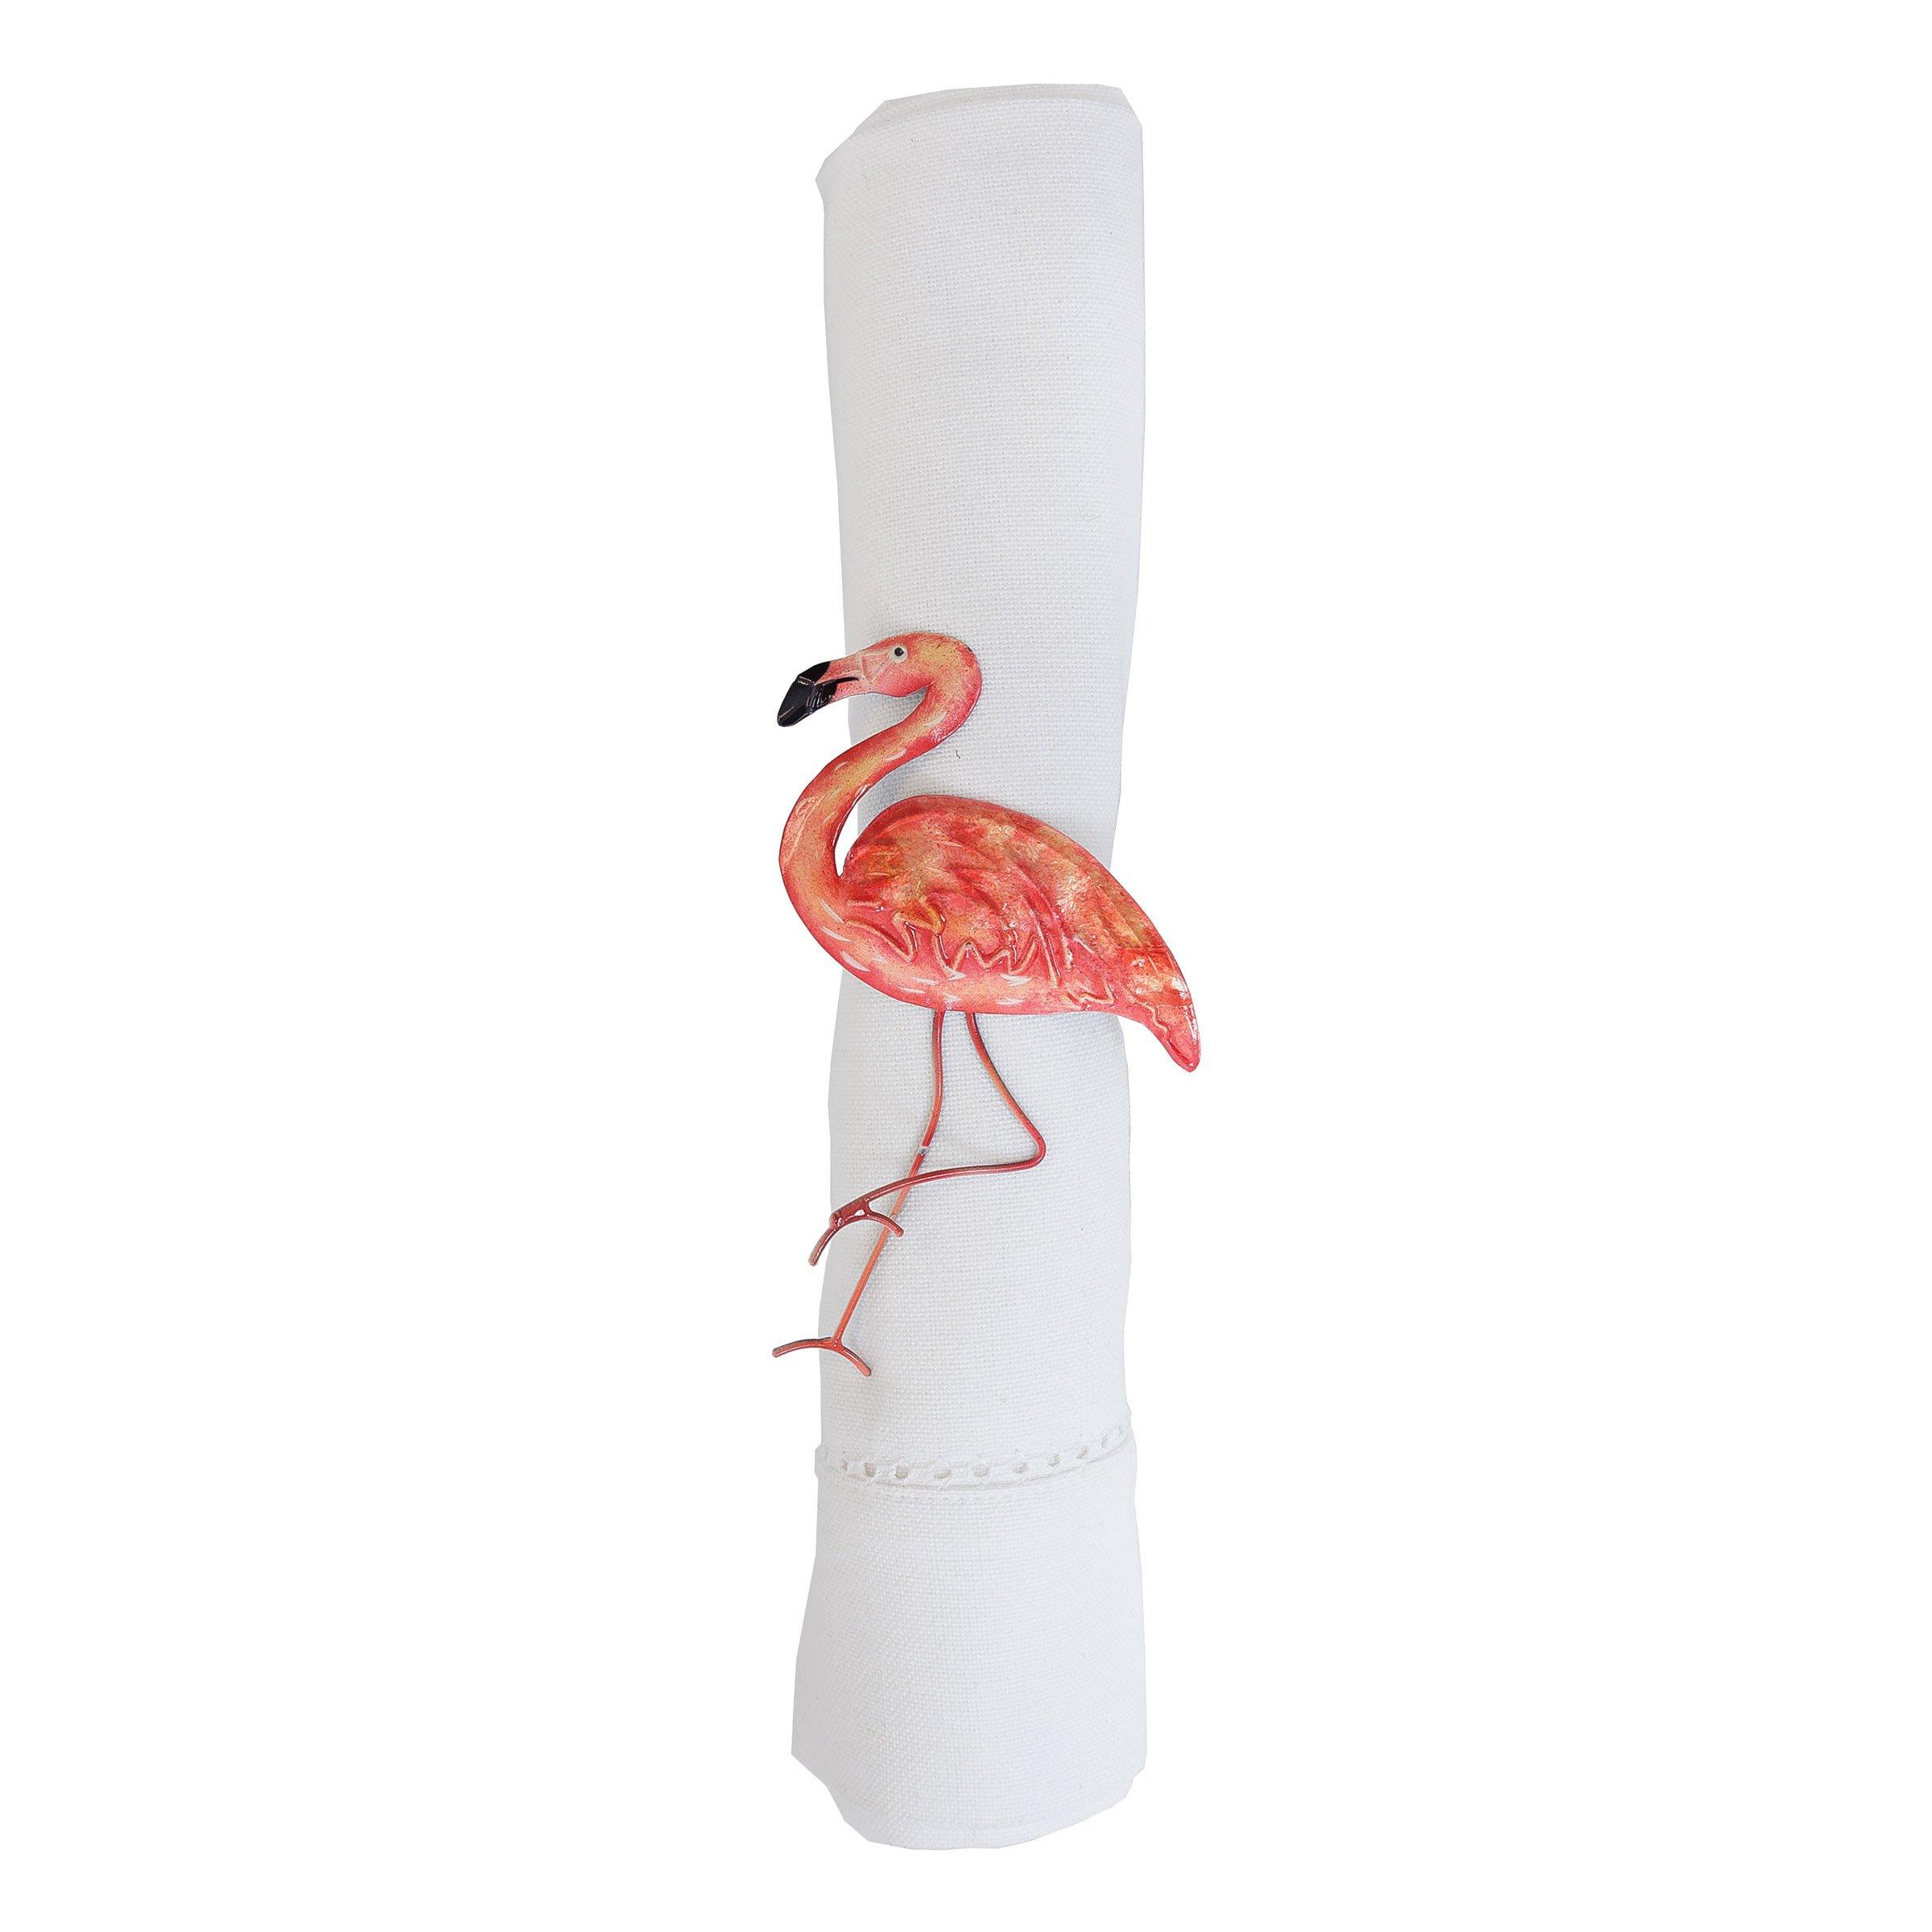 GALLERIE II Flamingo Napkin Ring Set of 6